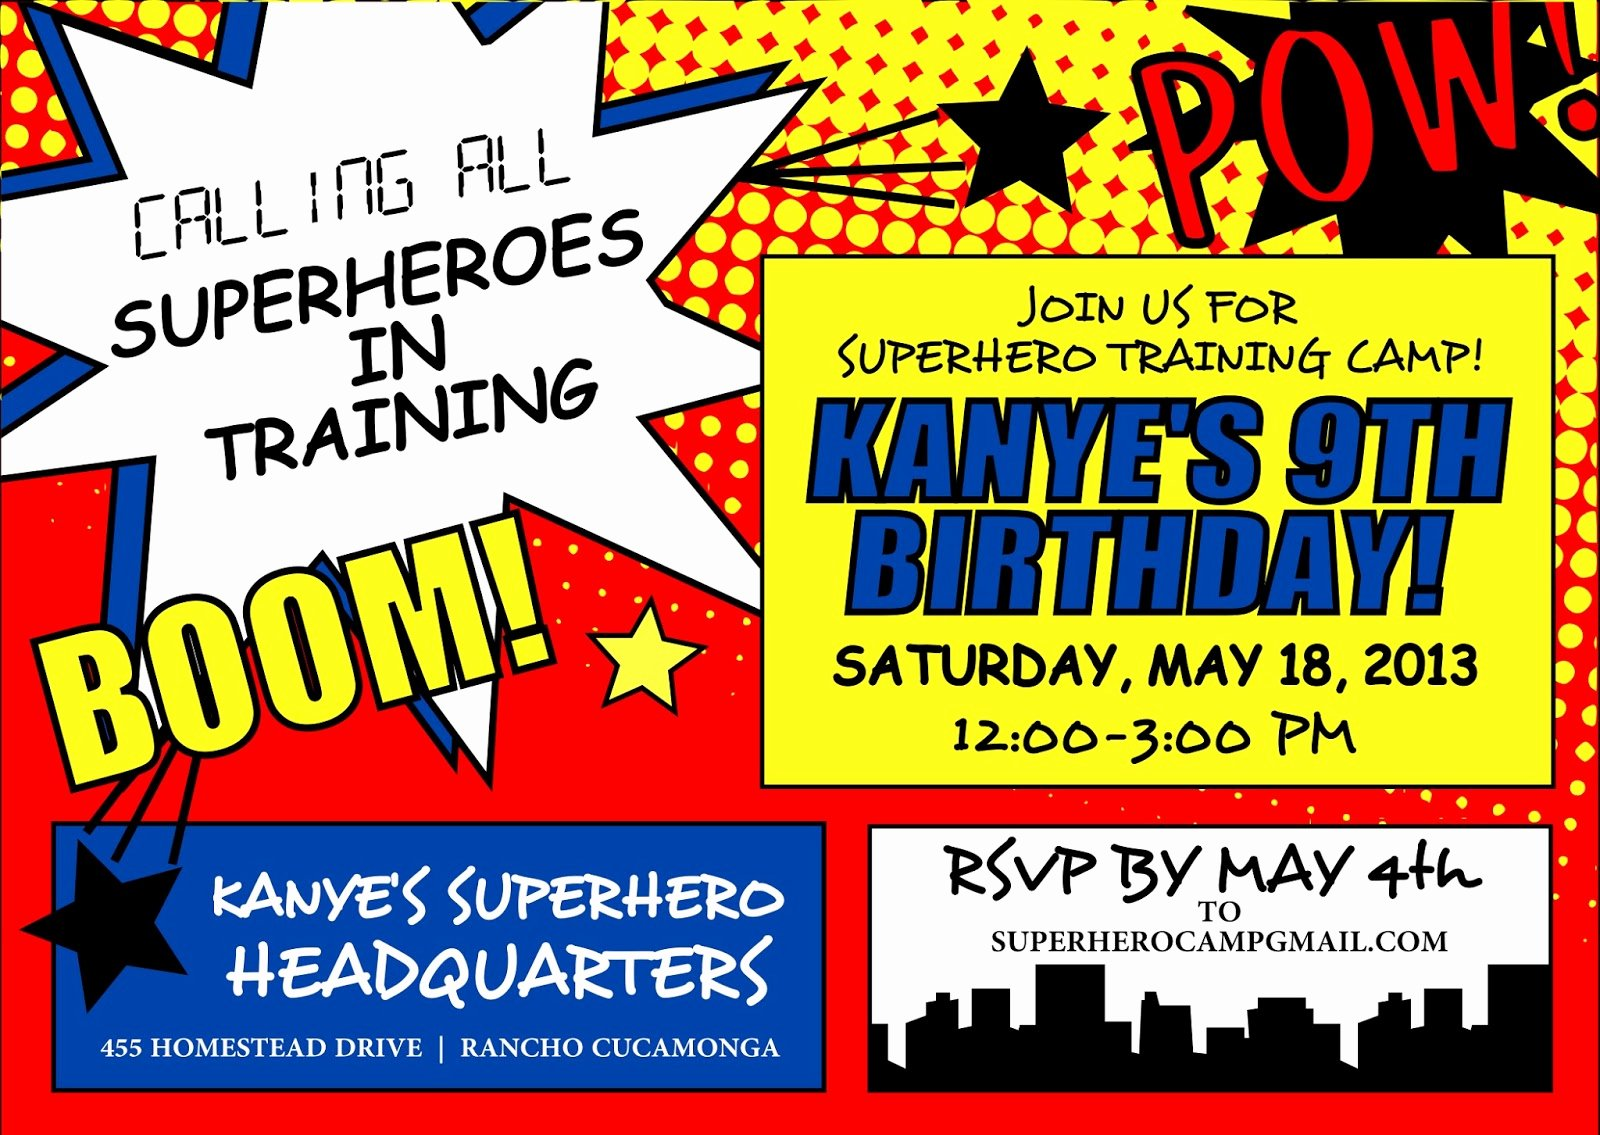 Free Superhero Invitation Templates New Signatures by Sarah Superhero Party Stationery for Amanda